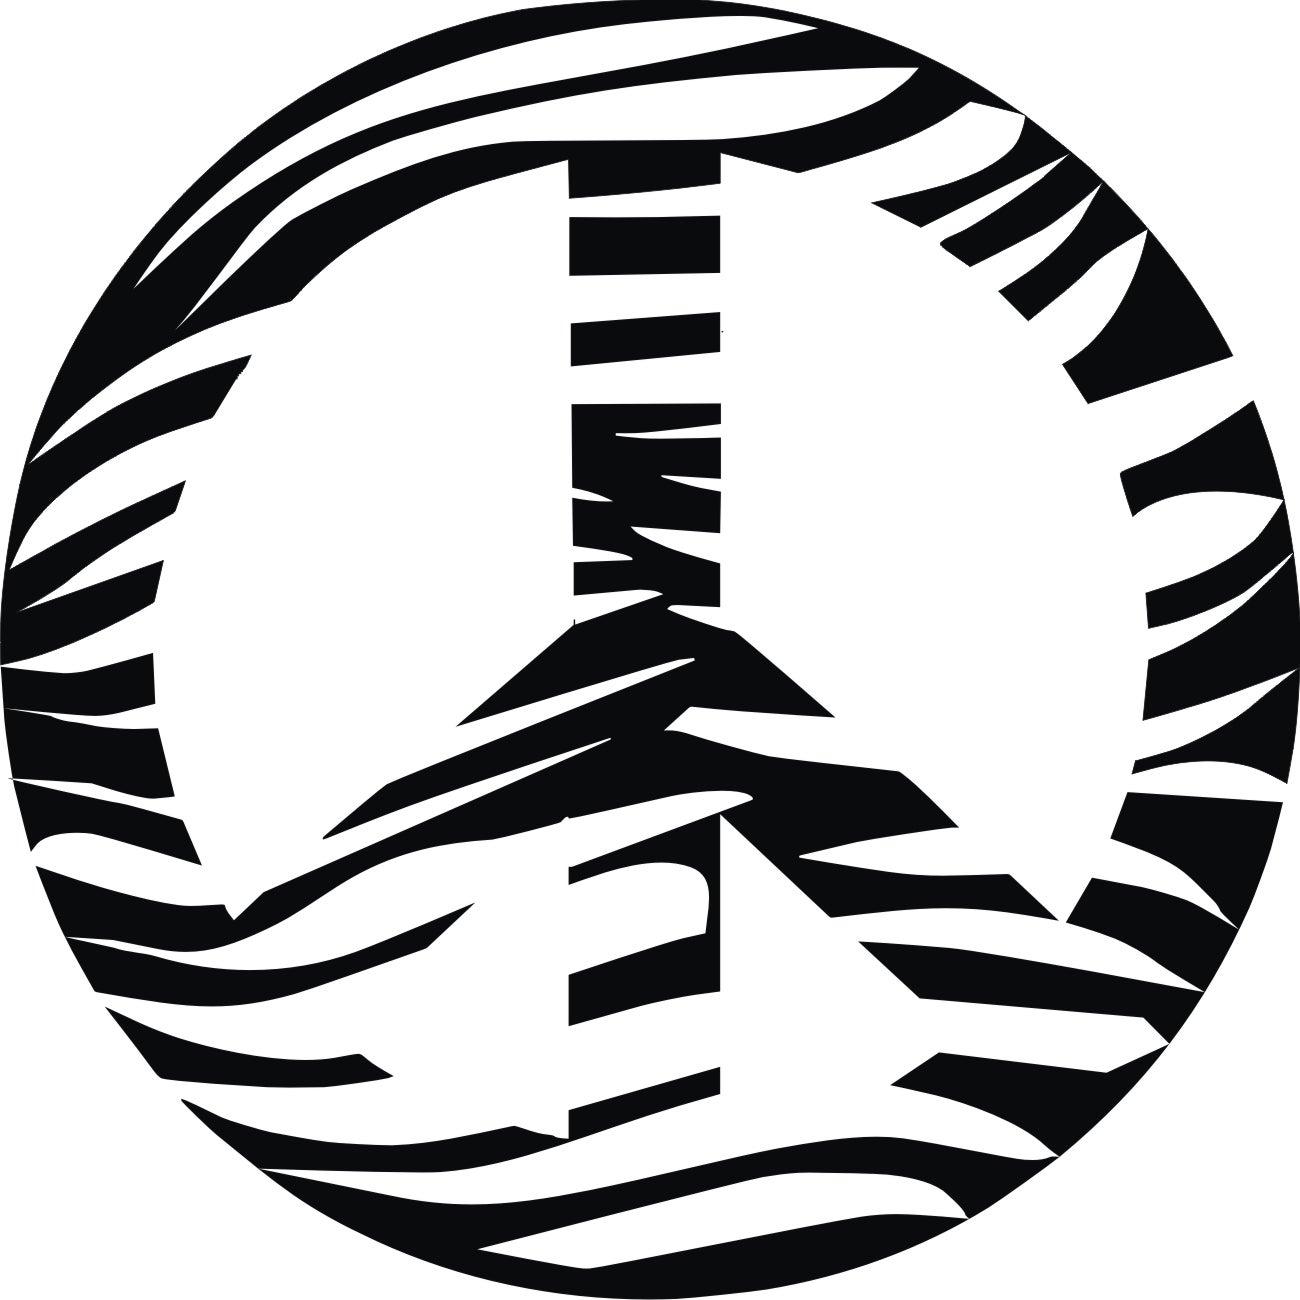 Vinyl Attraction 'Zebra Print Peace Sign' Vinyl Wall Decal